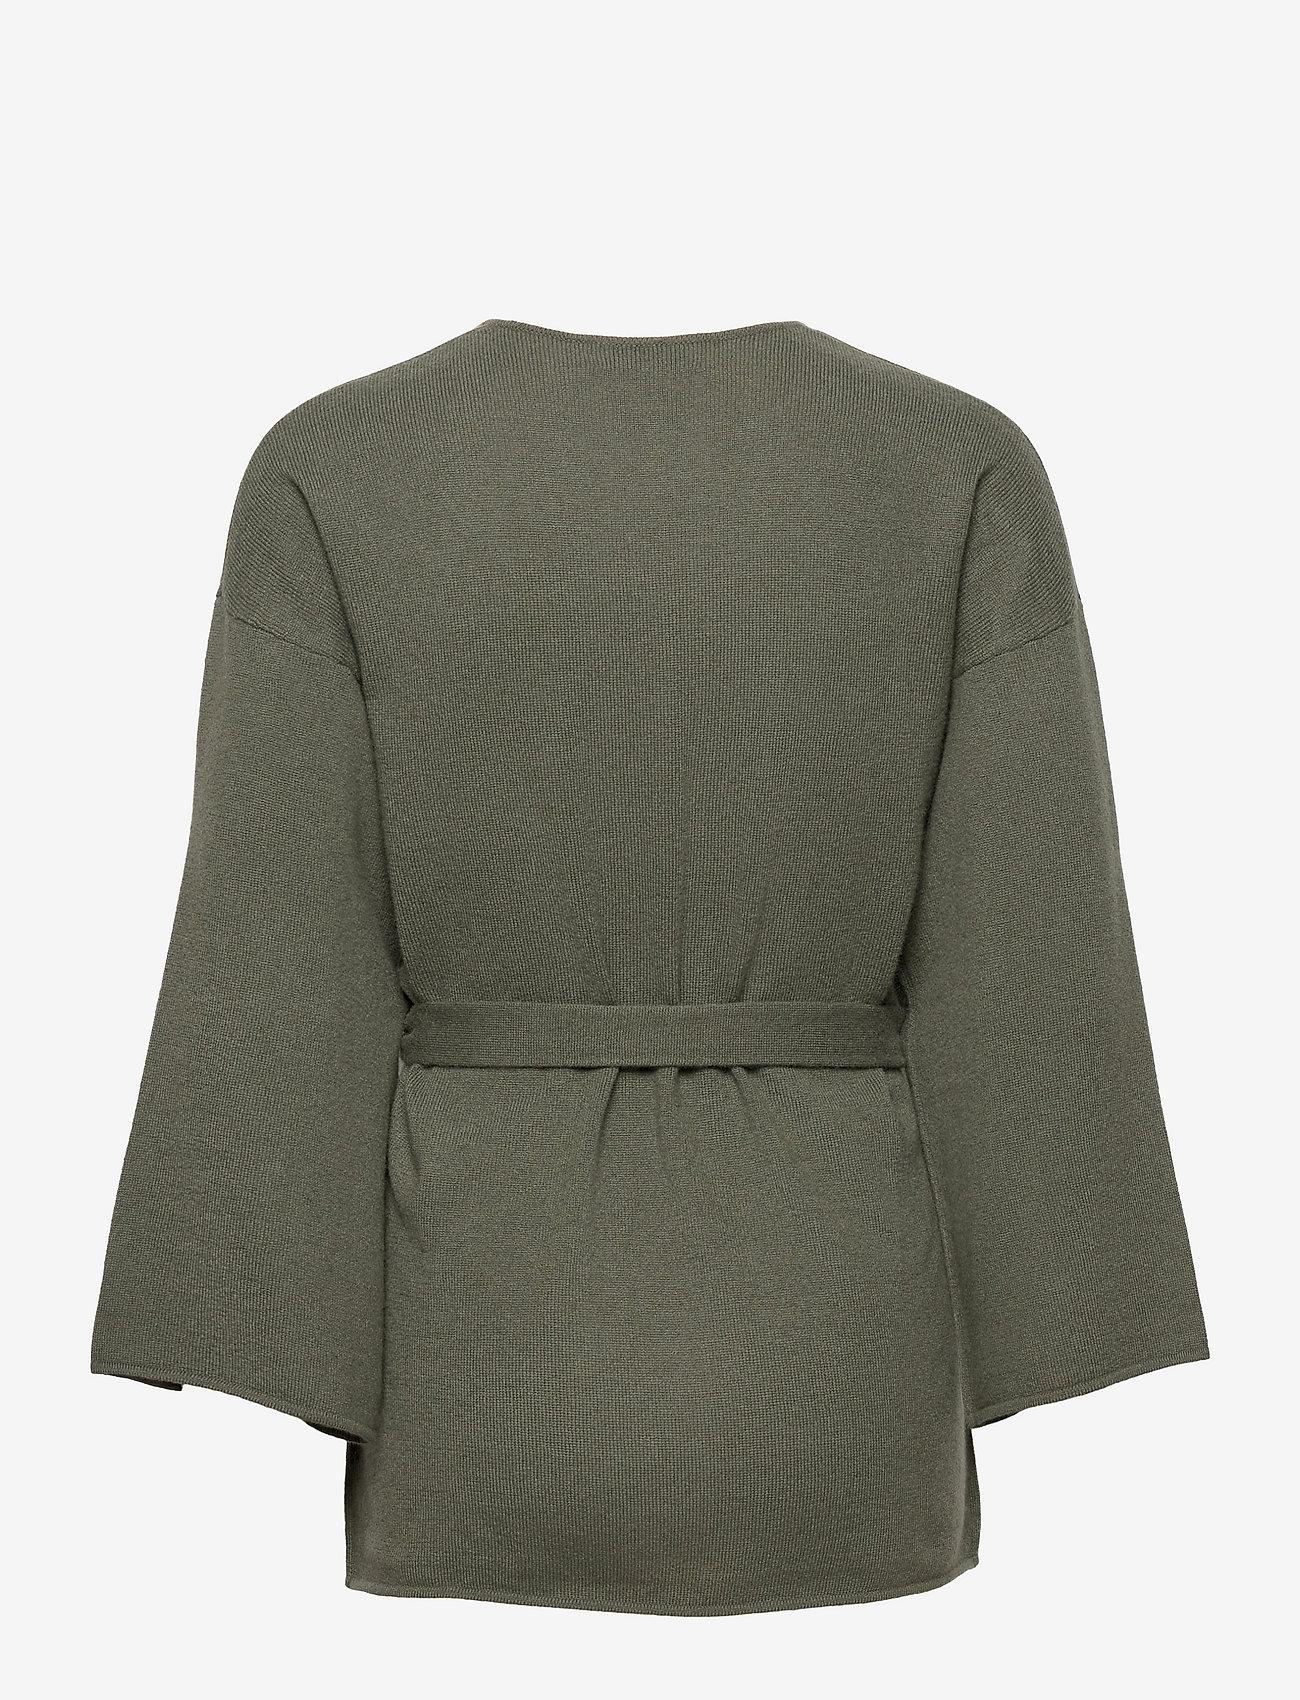 Davida Cashmere - Kimono - cardigans - army green - 1